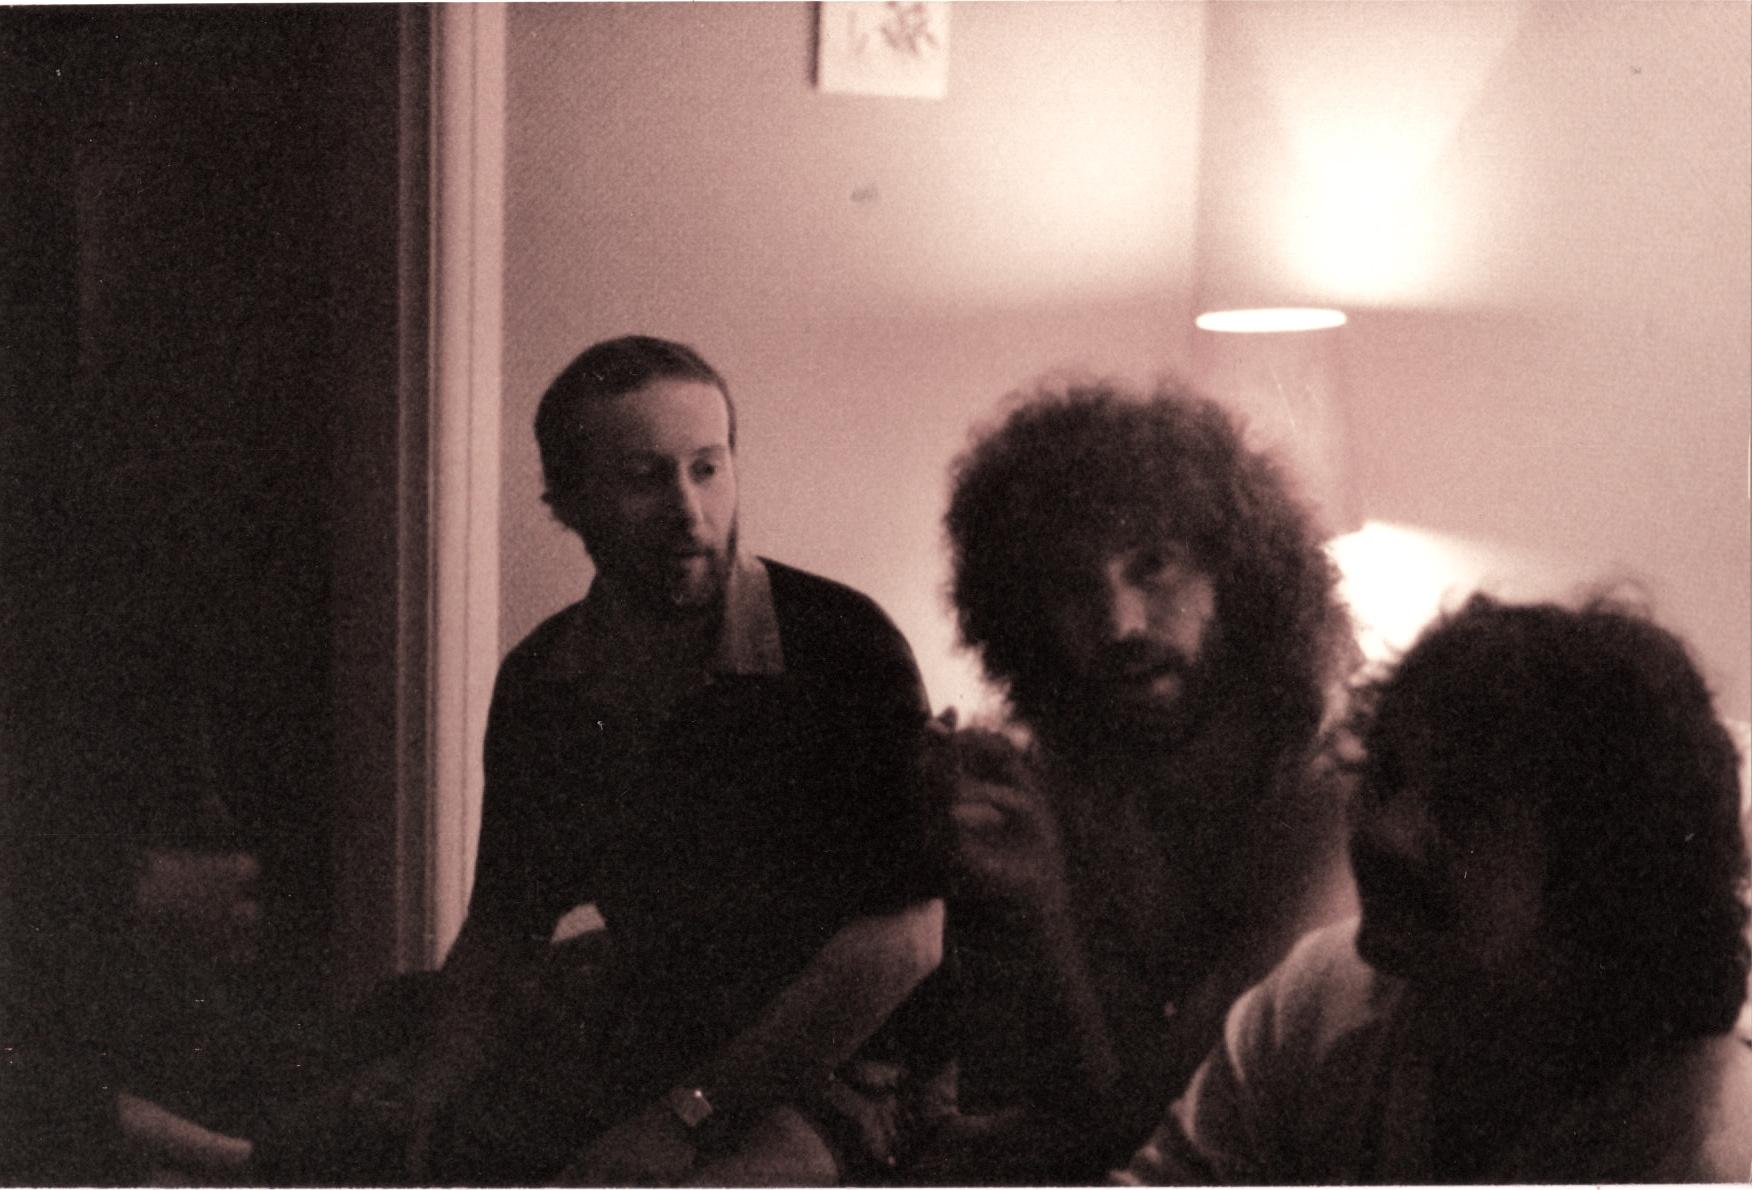 The sound team 84